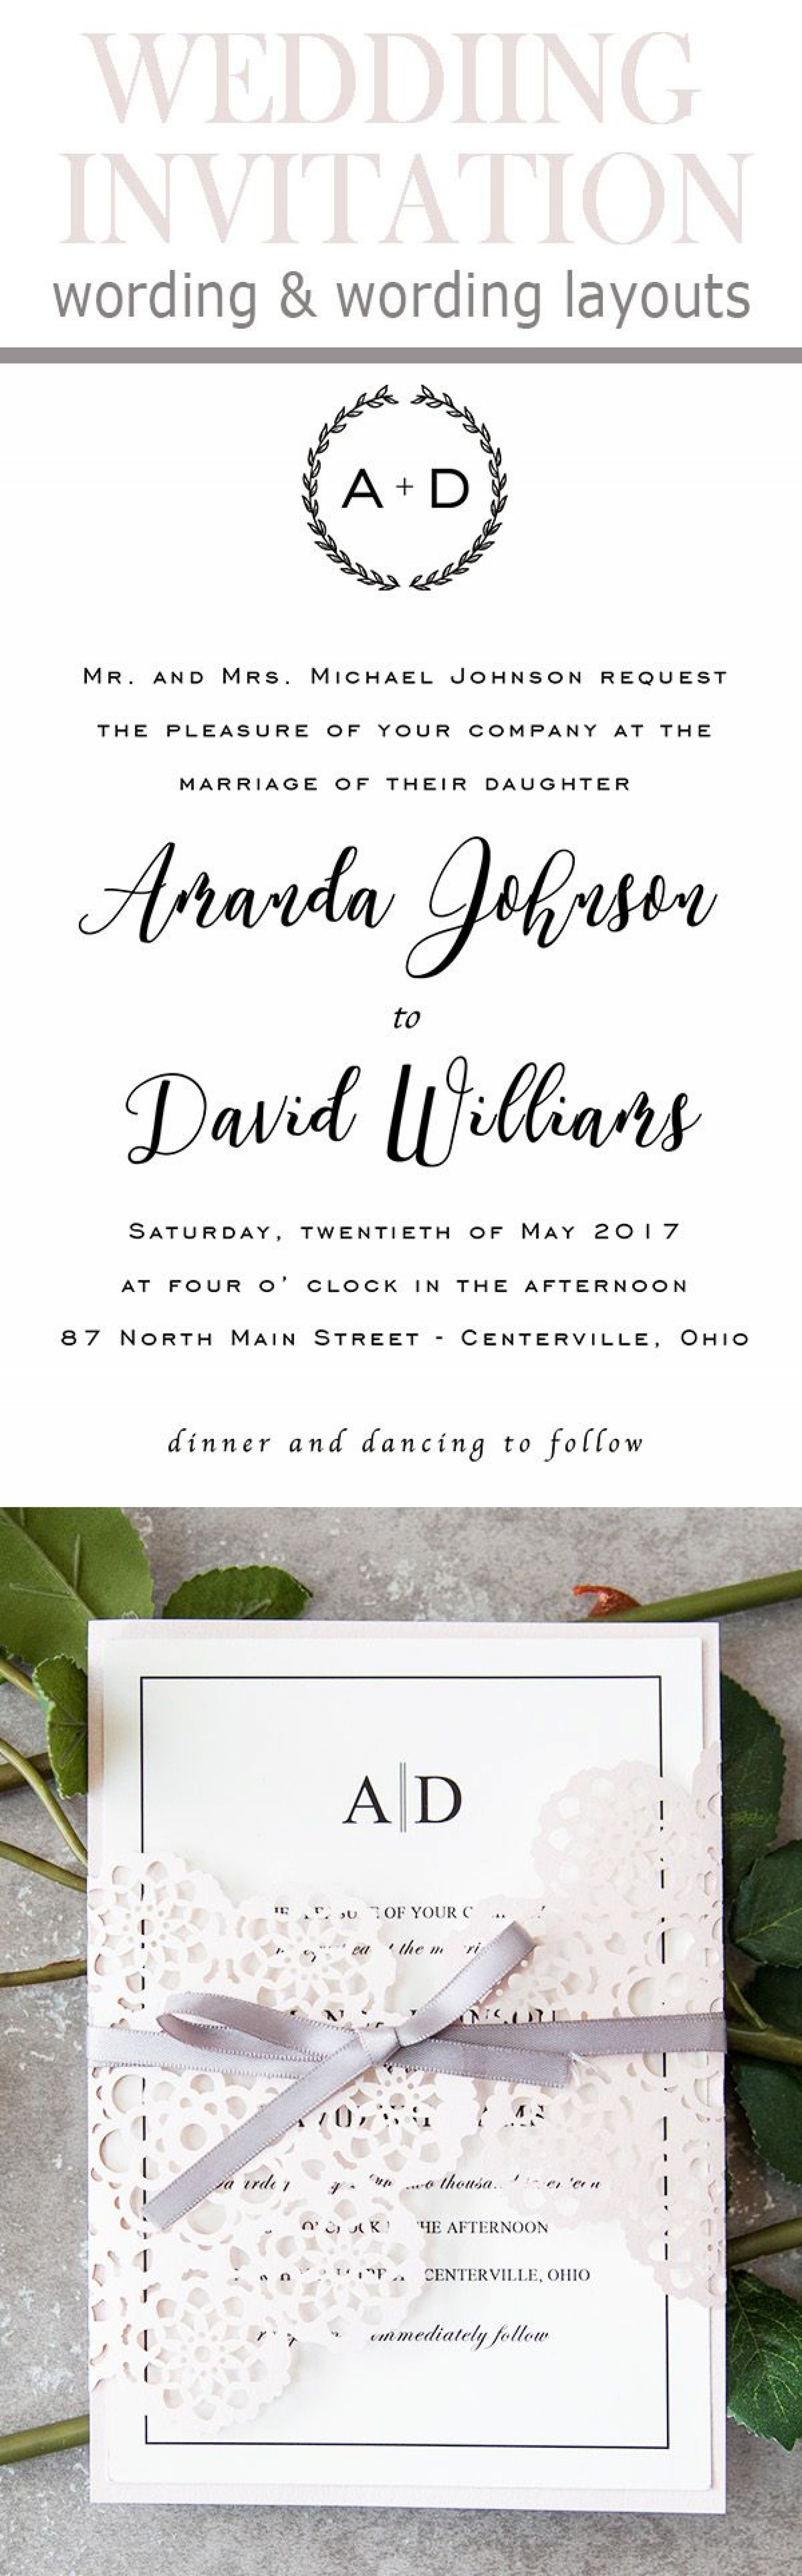 008 Remarkable Formal Wedding Invitation Wording Template Inspiration  Templates1920